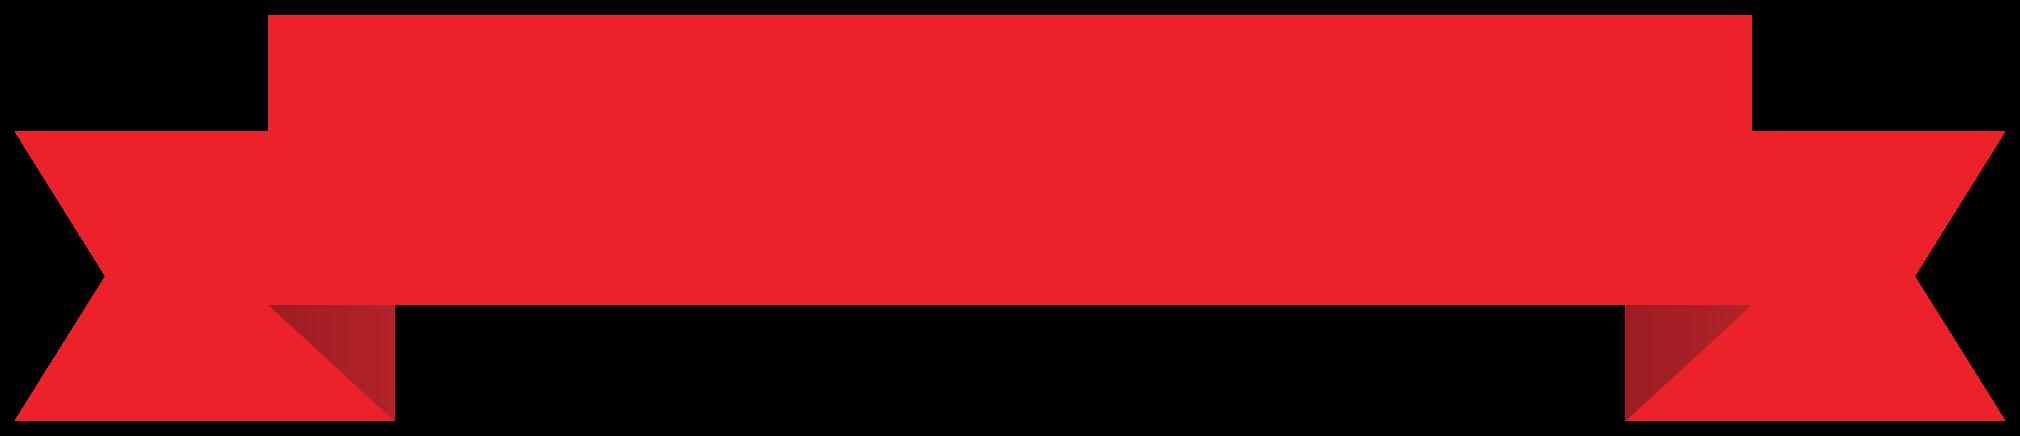 rött band png